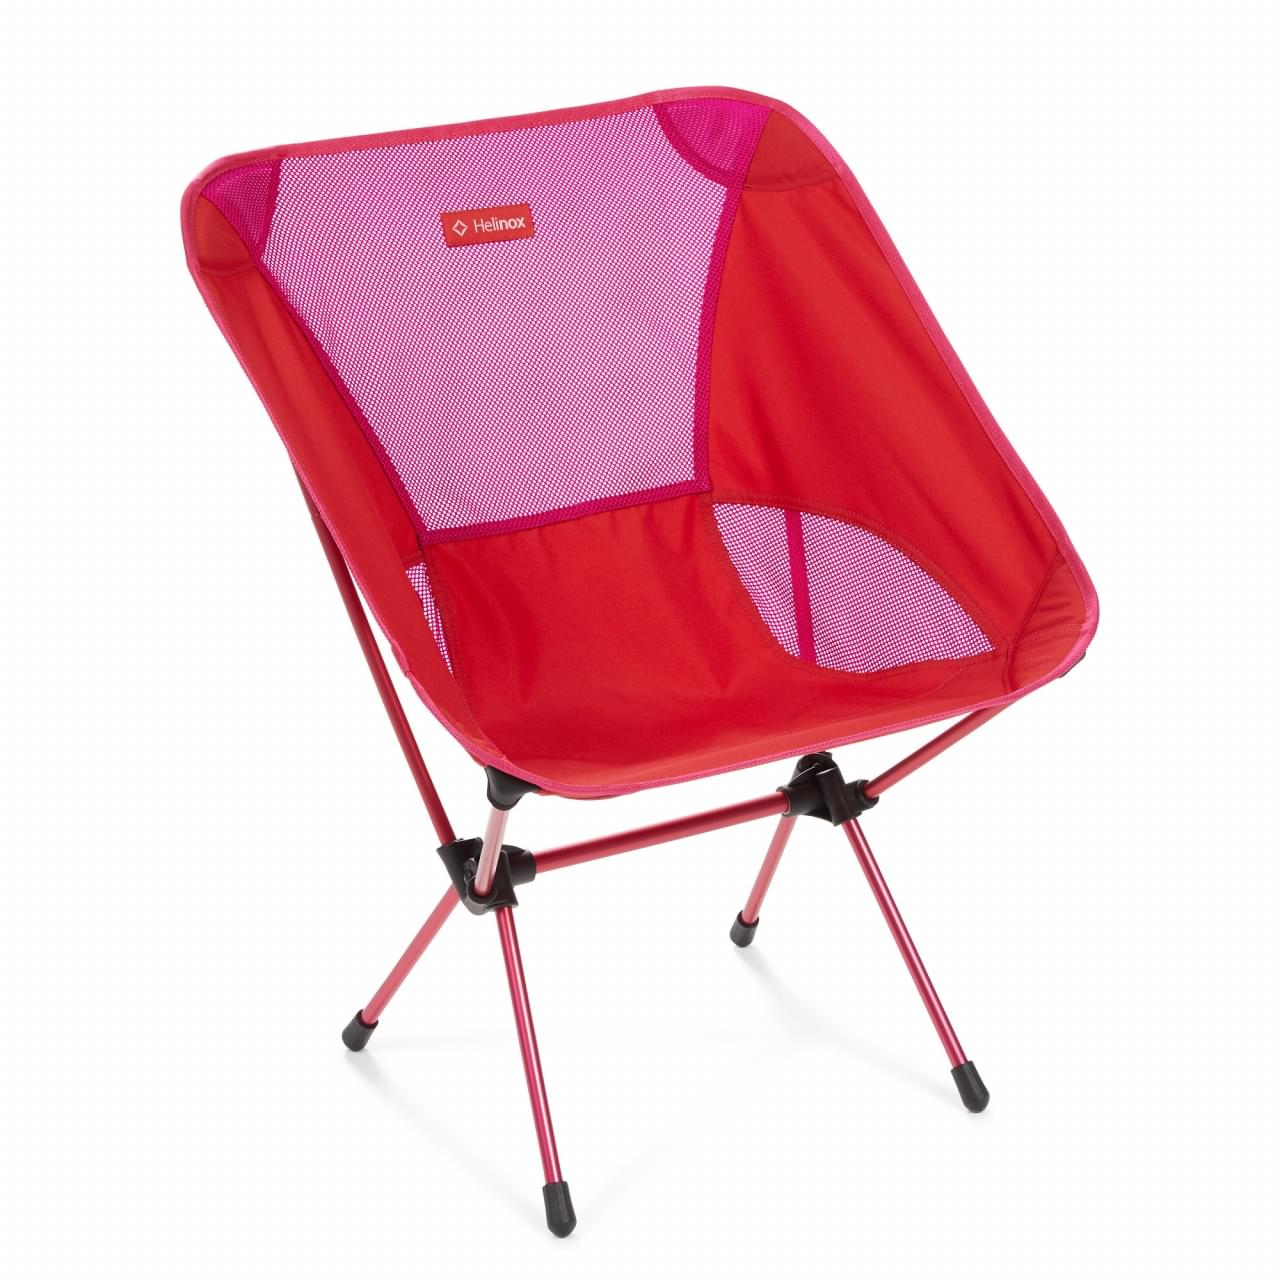 Helinox Chair One L Lichtgewicht Stoel - Rood